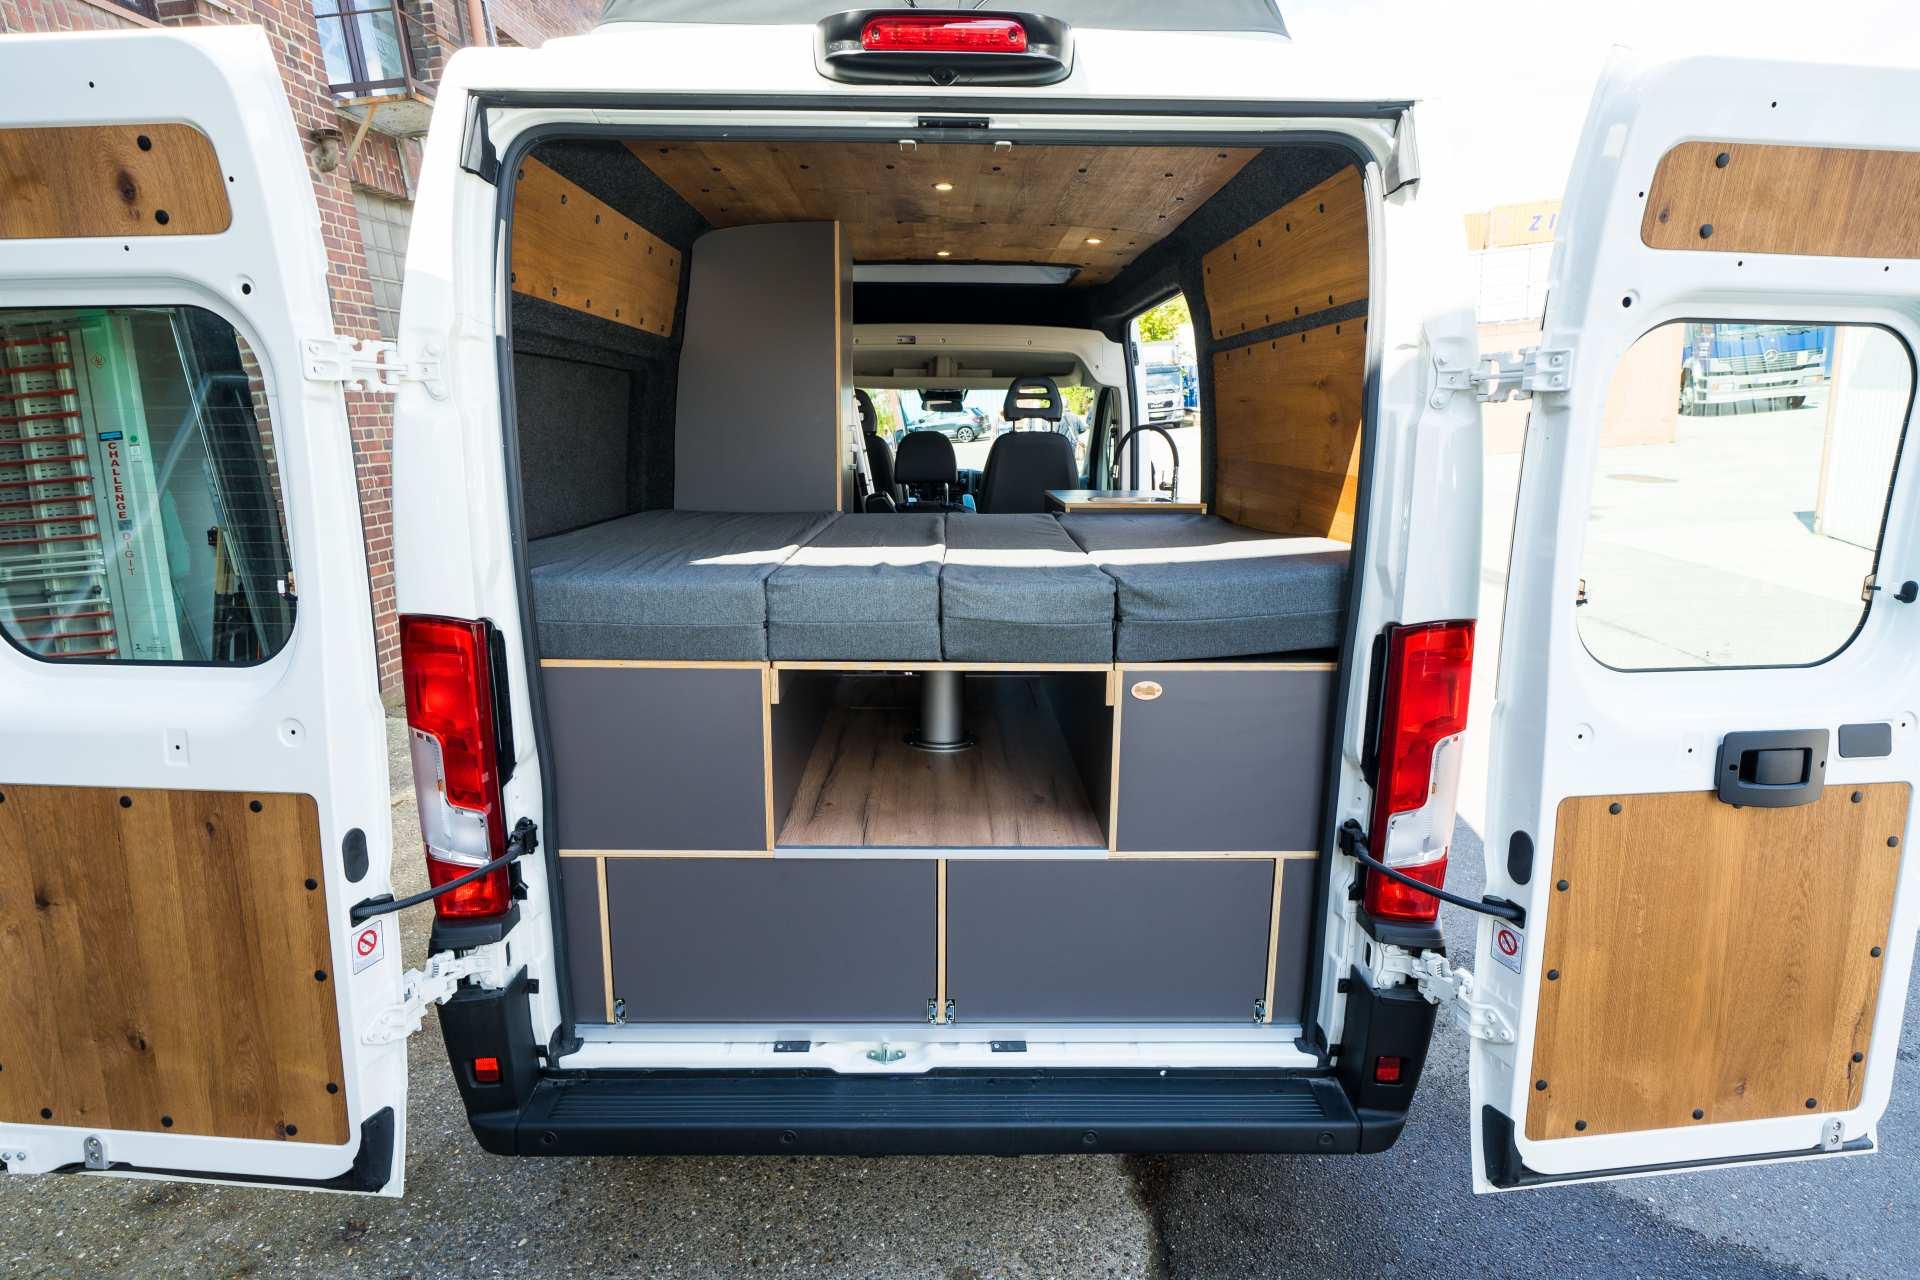 Individualausbau: Zwei-Raumwohnung Peugeot Boxer L2 H2 - 19